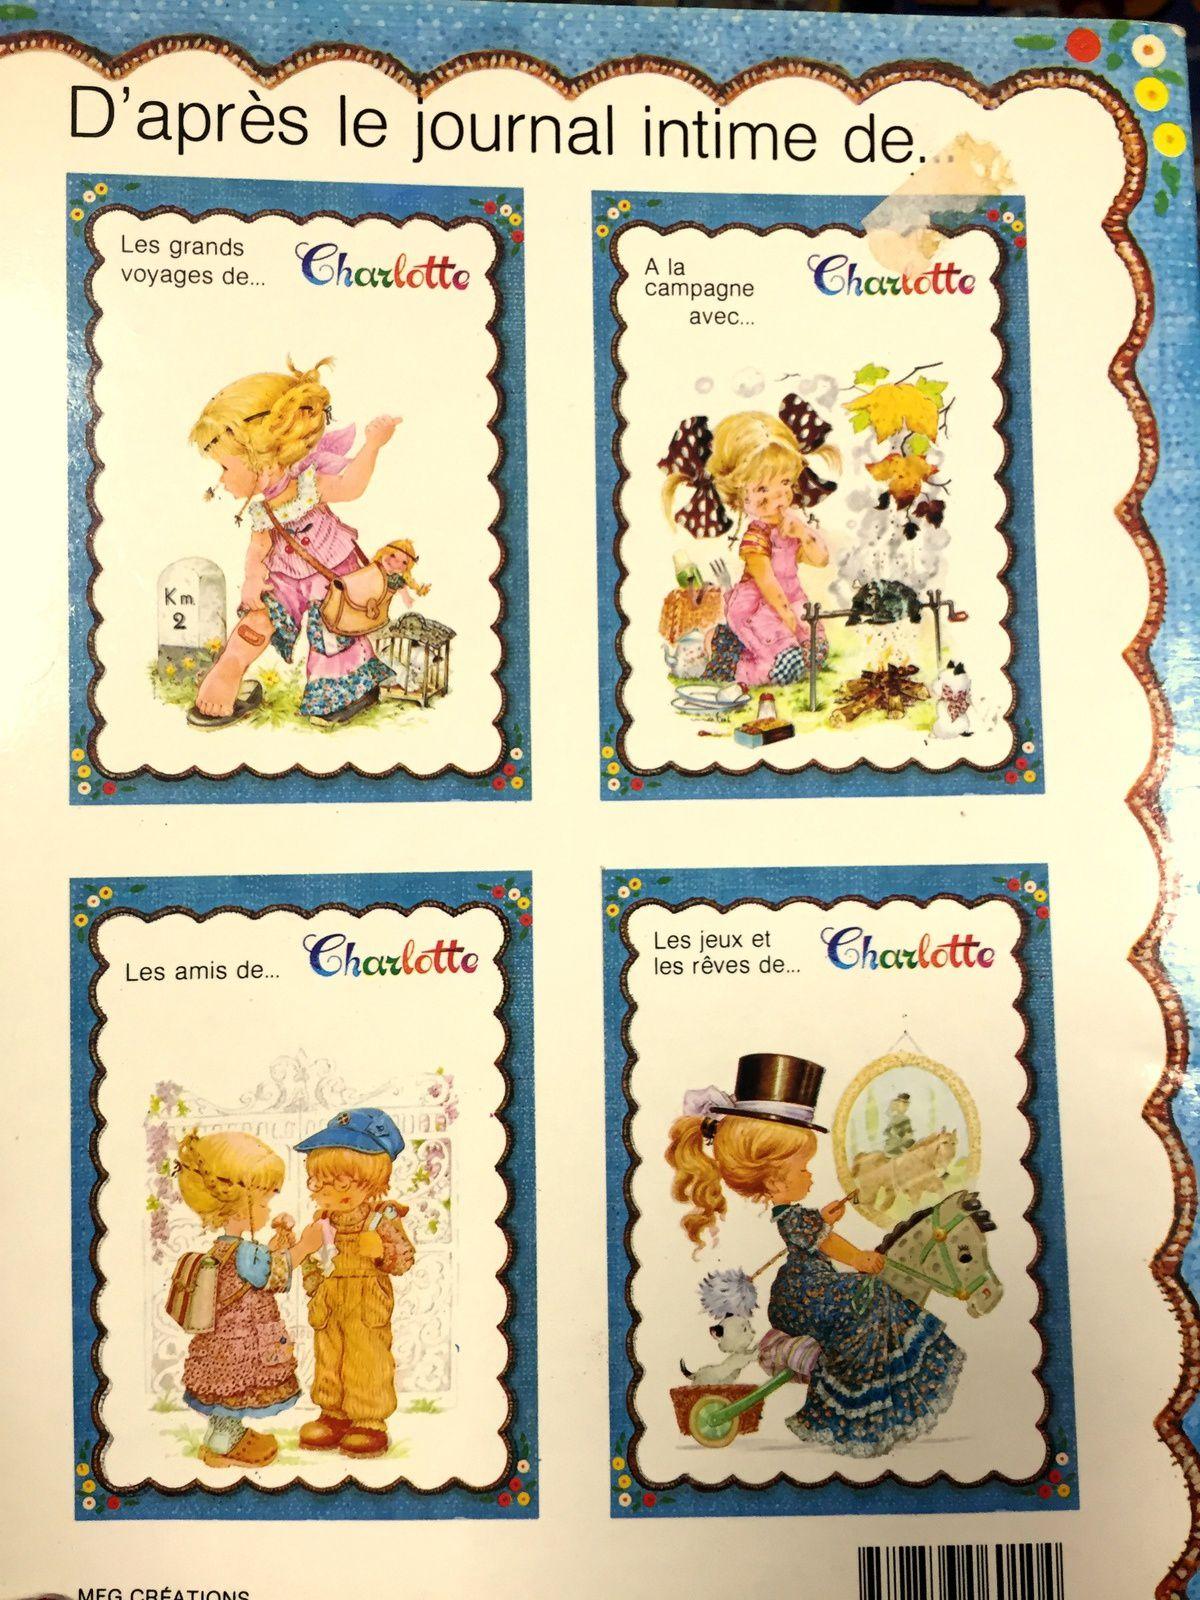 #charlotte #livre #prenom #charlotteblabla blog